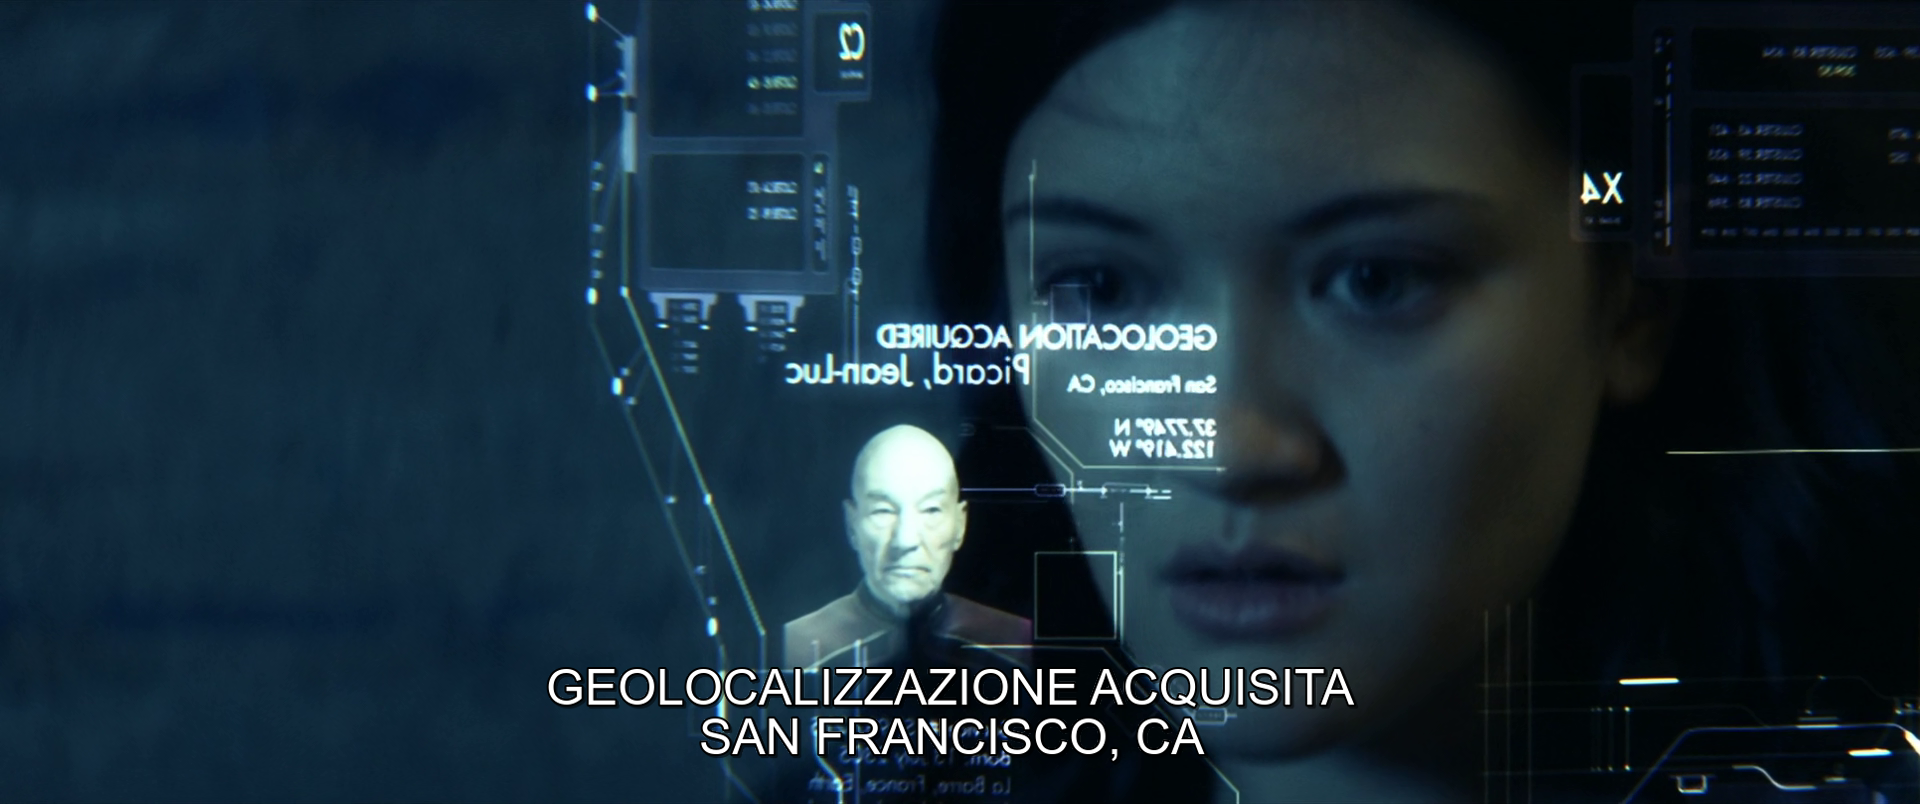 Star Trek - Picard - Stagione 1 (2020) (5/10) WEBMux 1080P HEVC ITA ENG AC3 x265 mkv Vlcsnap-2020-01-24-04k4k5x